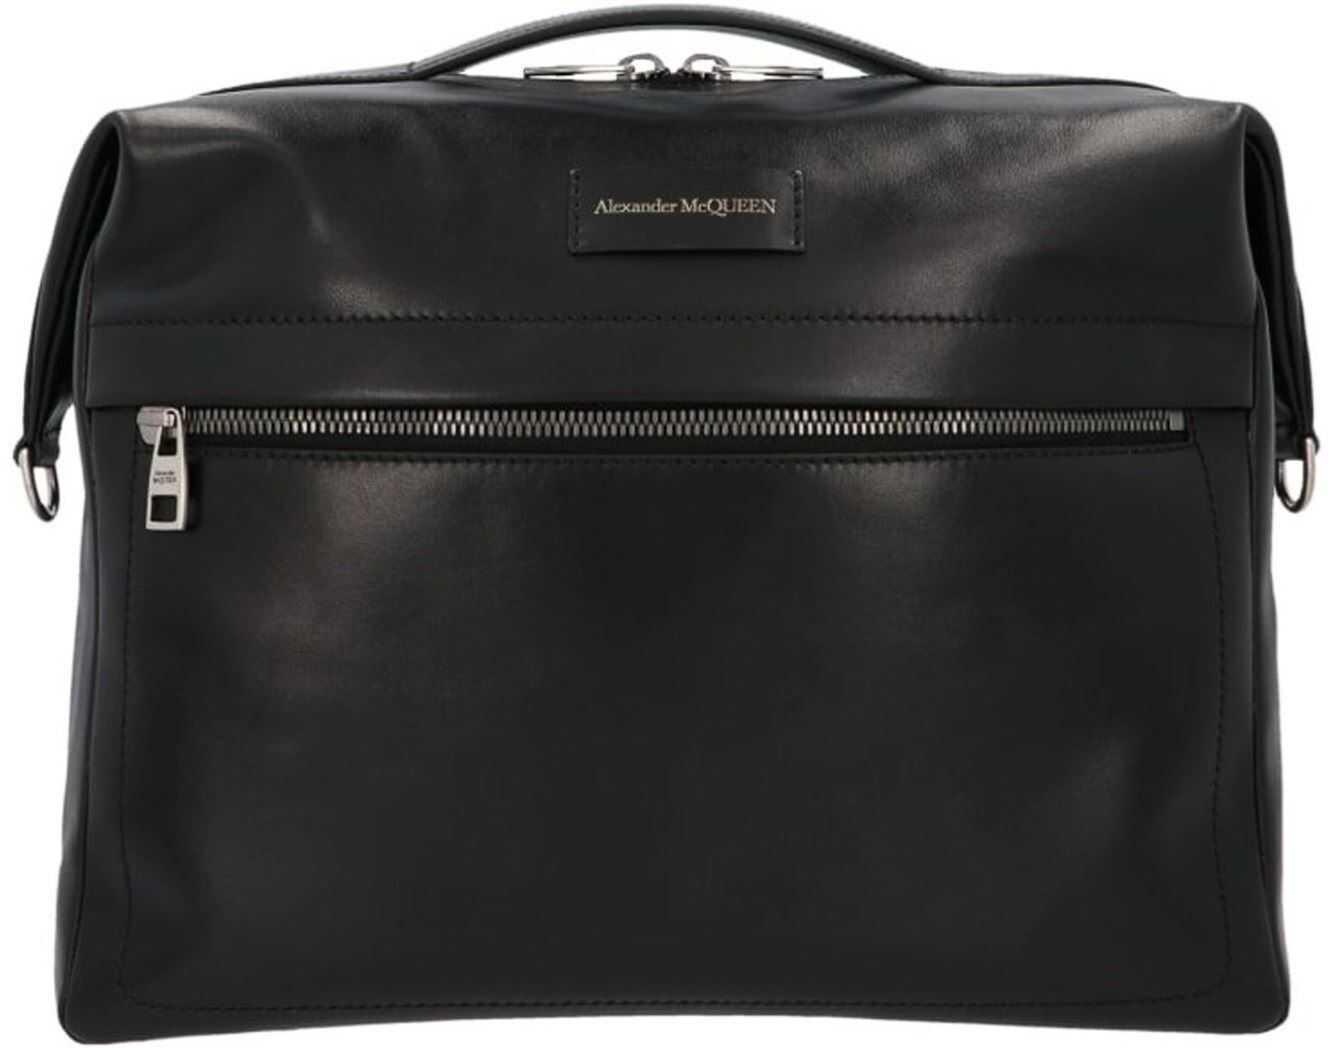 Alexander McQueen Messenger Bag In Black 6255071XI0Y1000 Black imagine b-mall.ro